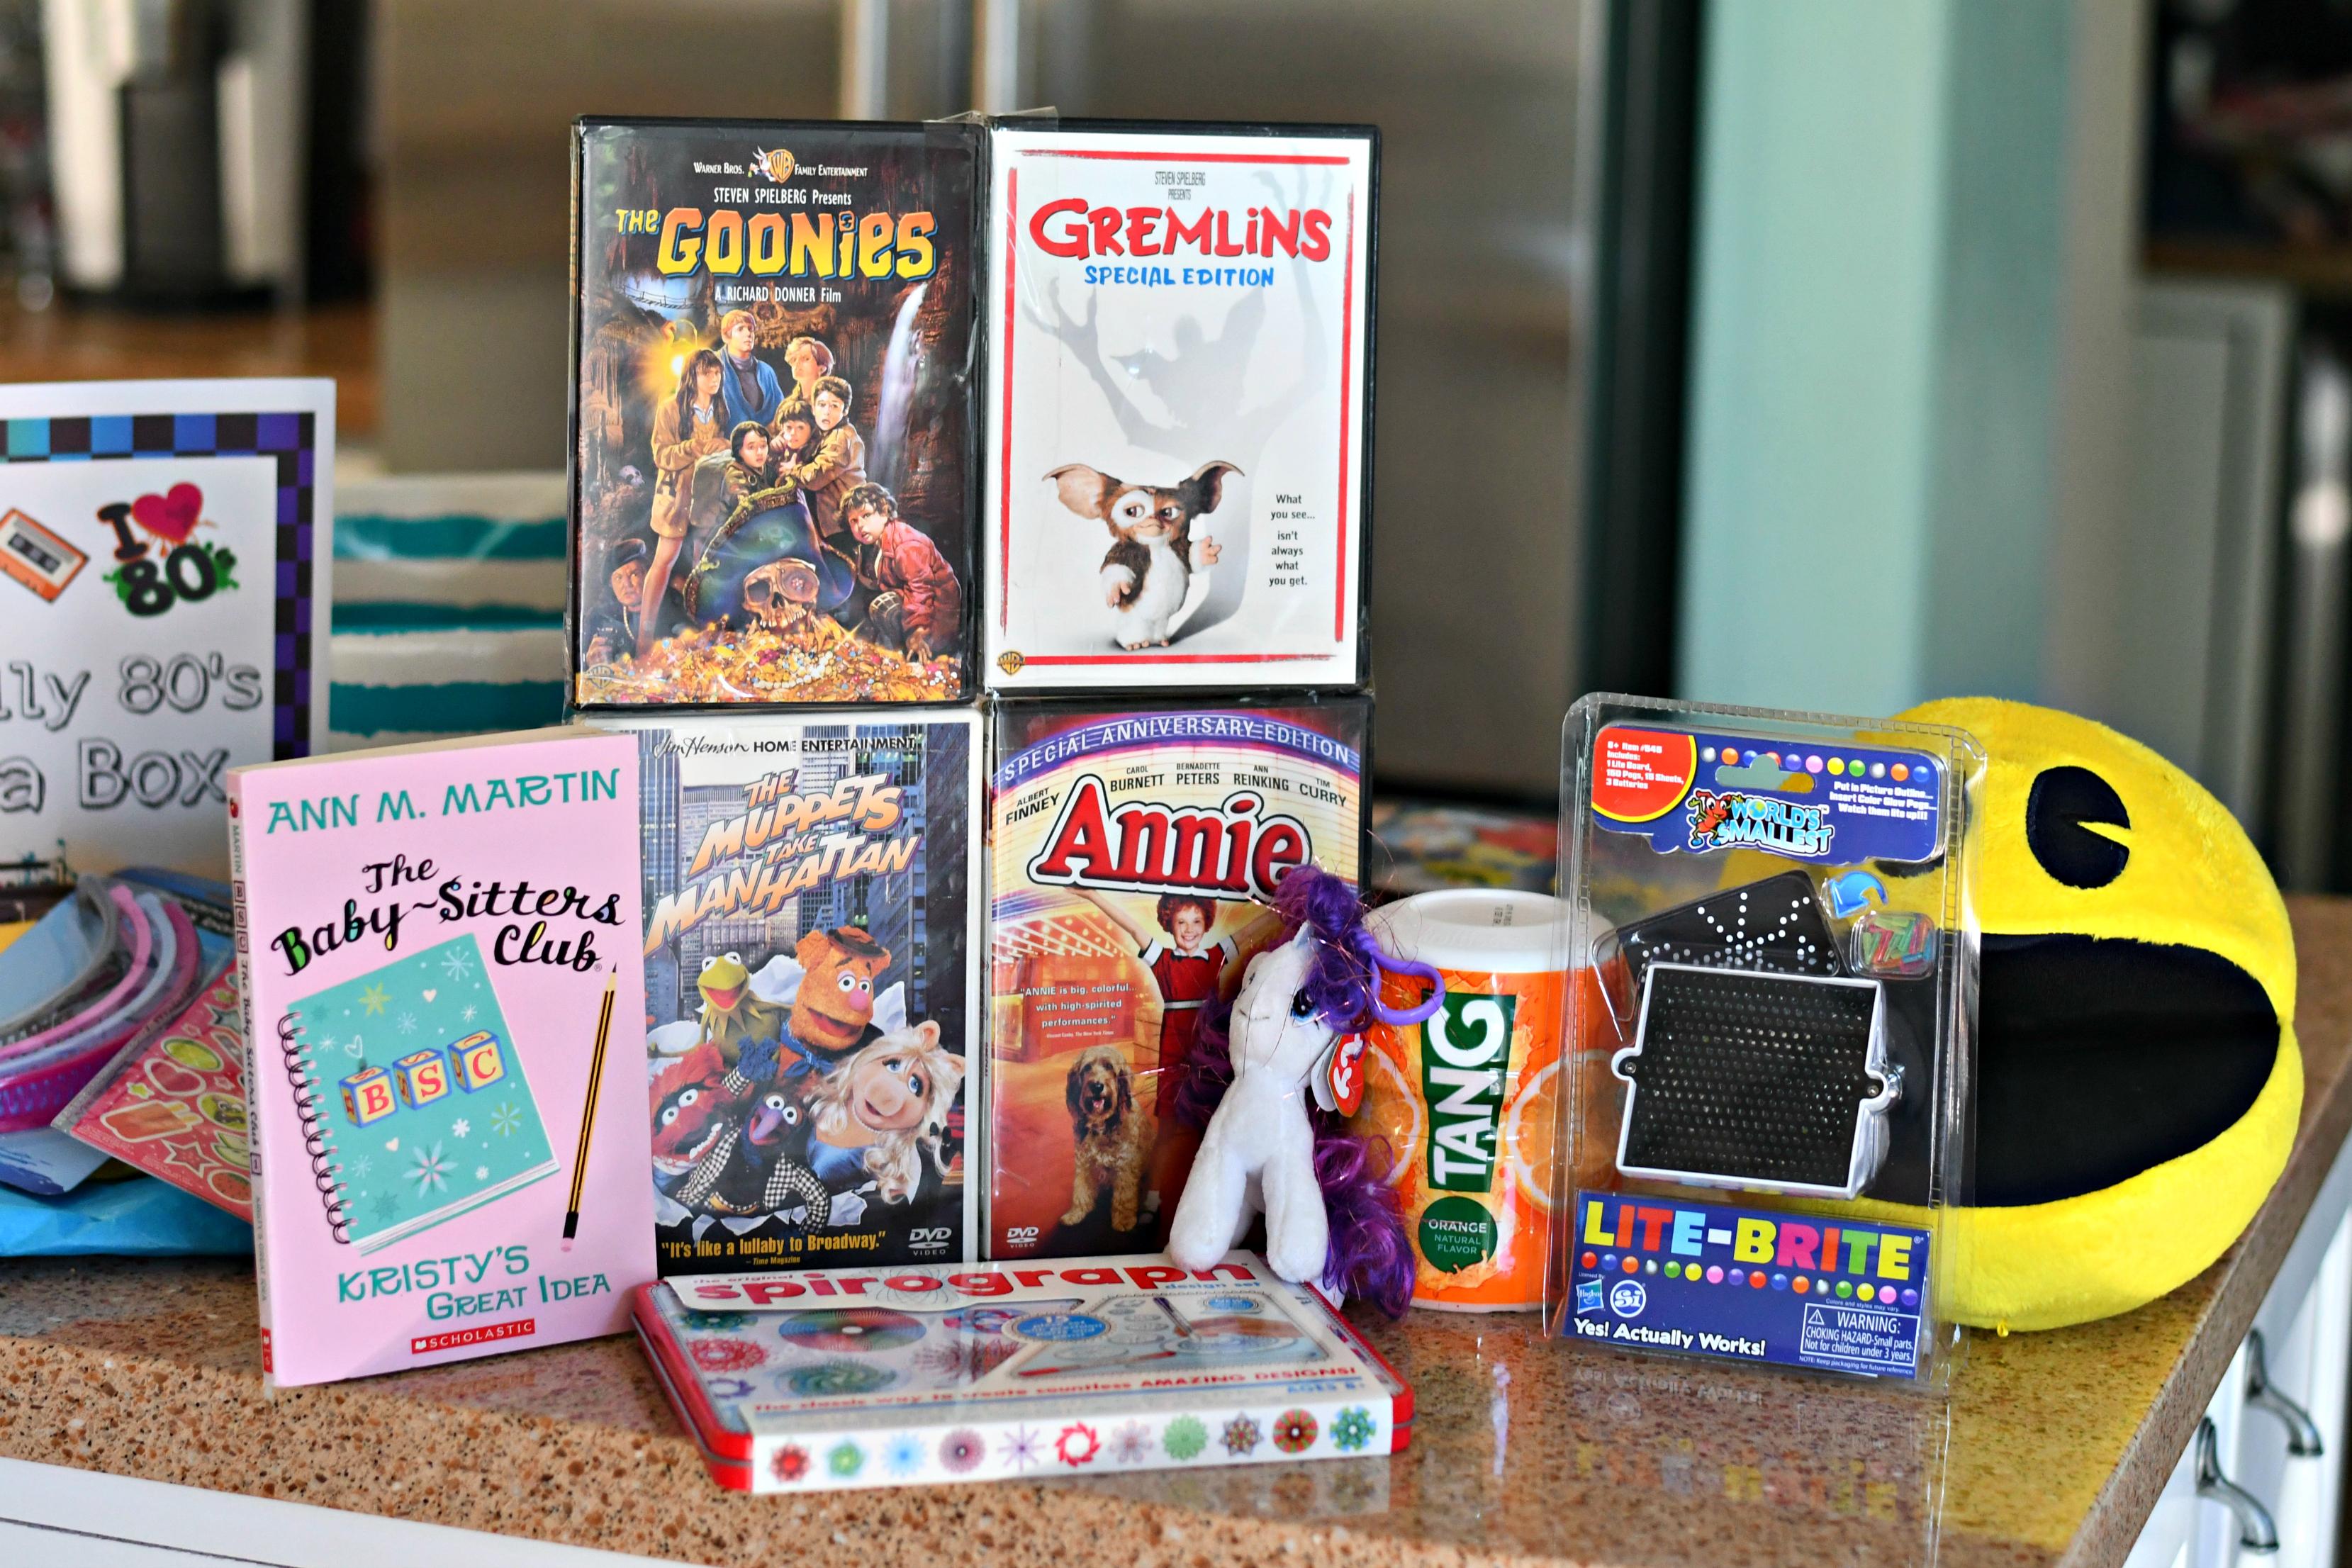 80s box gift idea – Goonies, Gremlins, Tang, and more